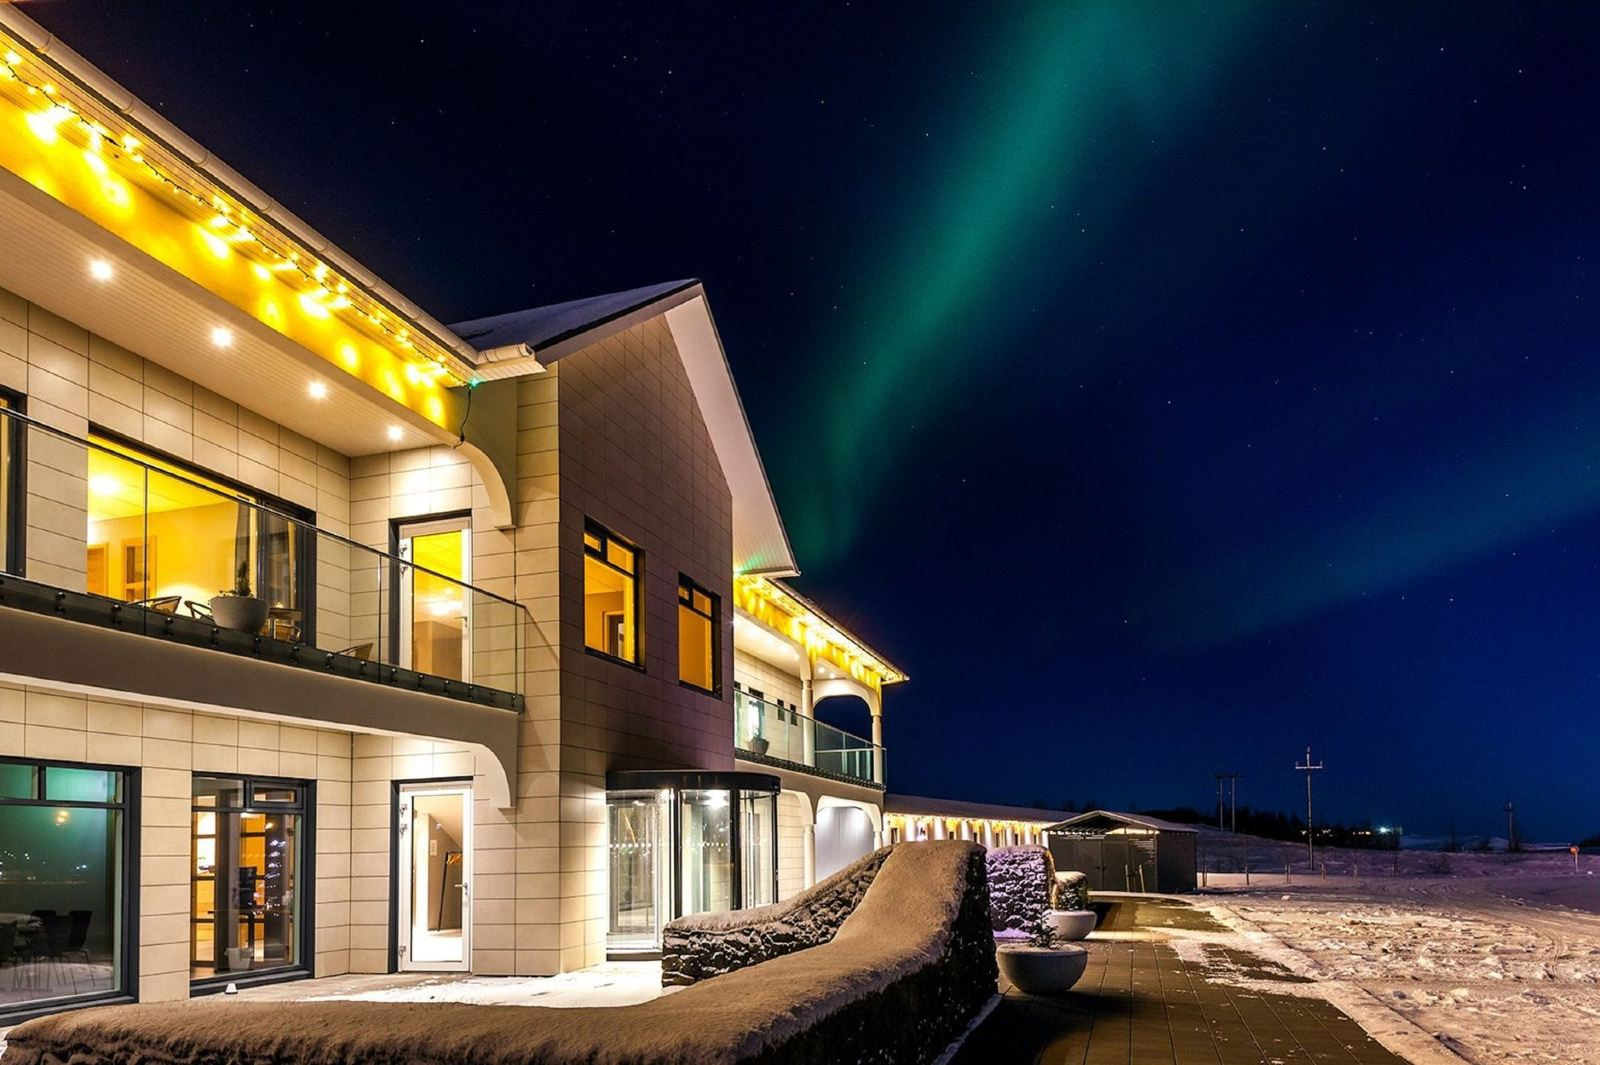 Stracta Hotel Hella - Skyscanner Hotels